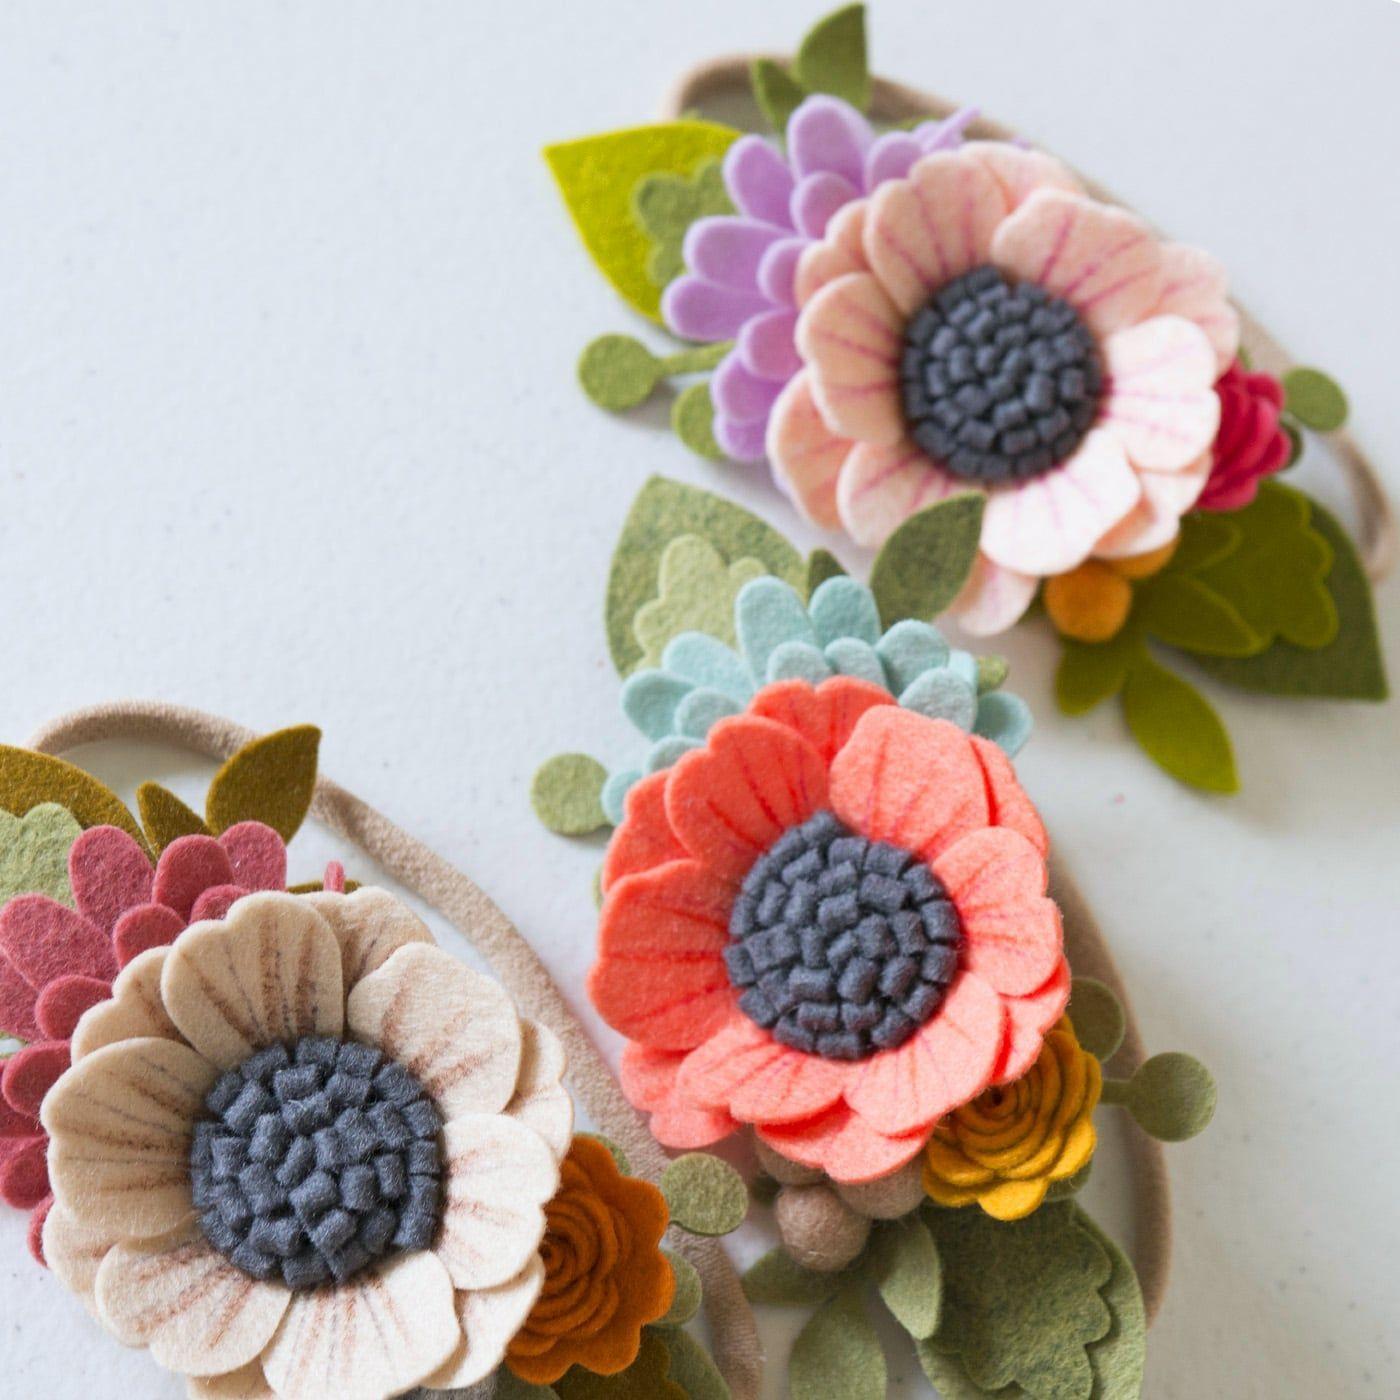 DIY Felt Flower Headband - Instagram Live #feltflowerheadbands DIY Felt Flower Headband - Instagram Live #feltflowerheadbands